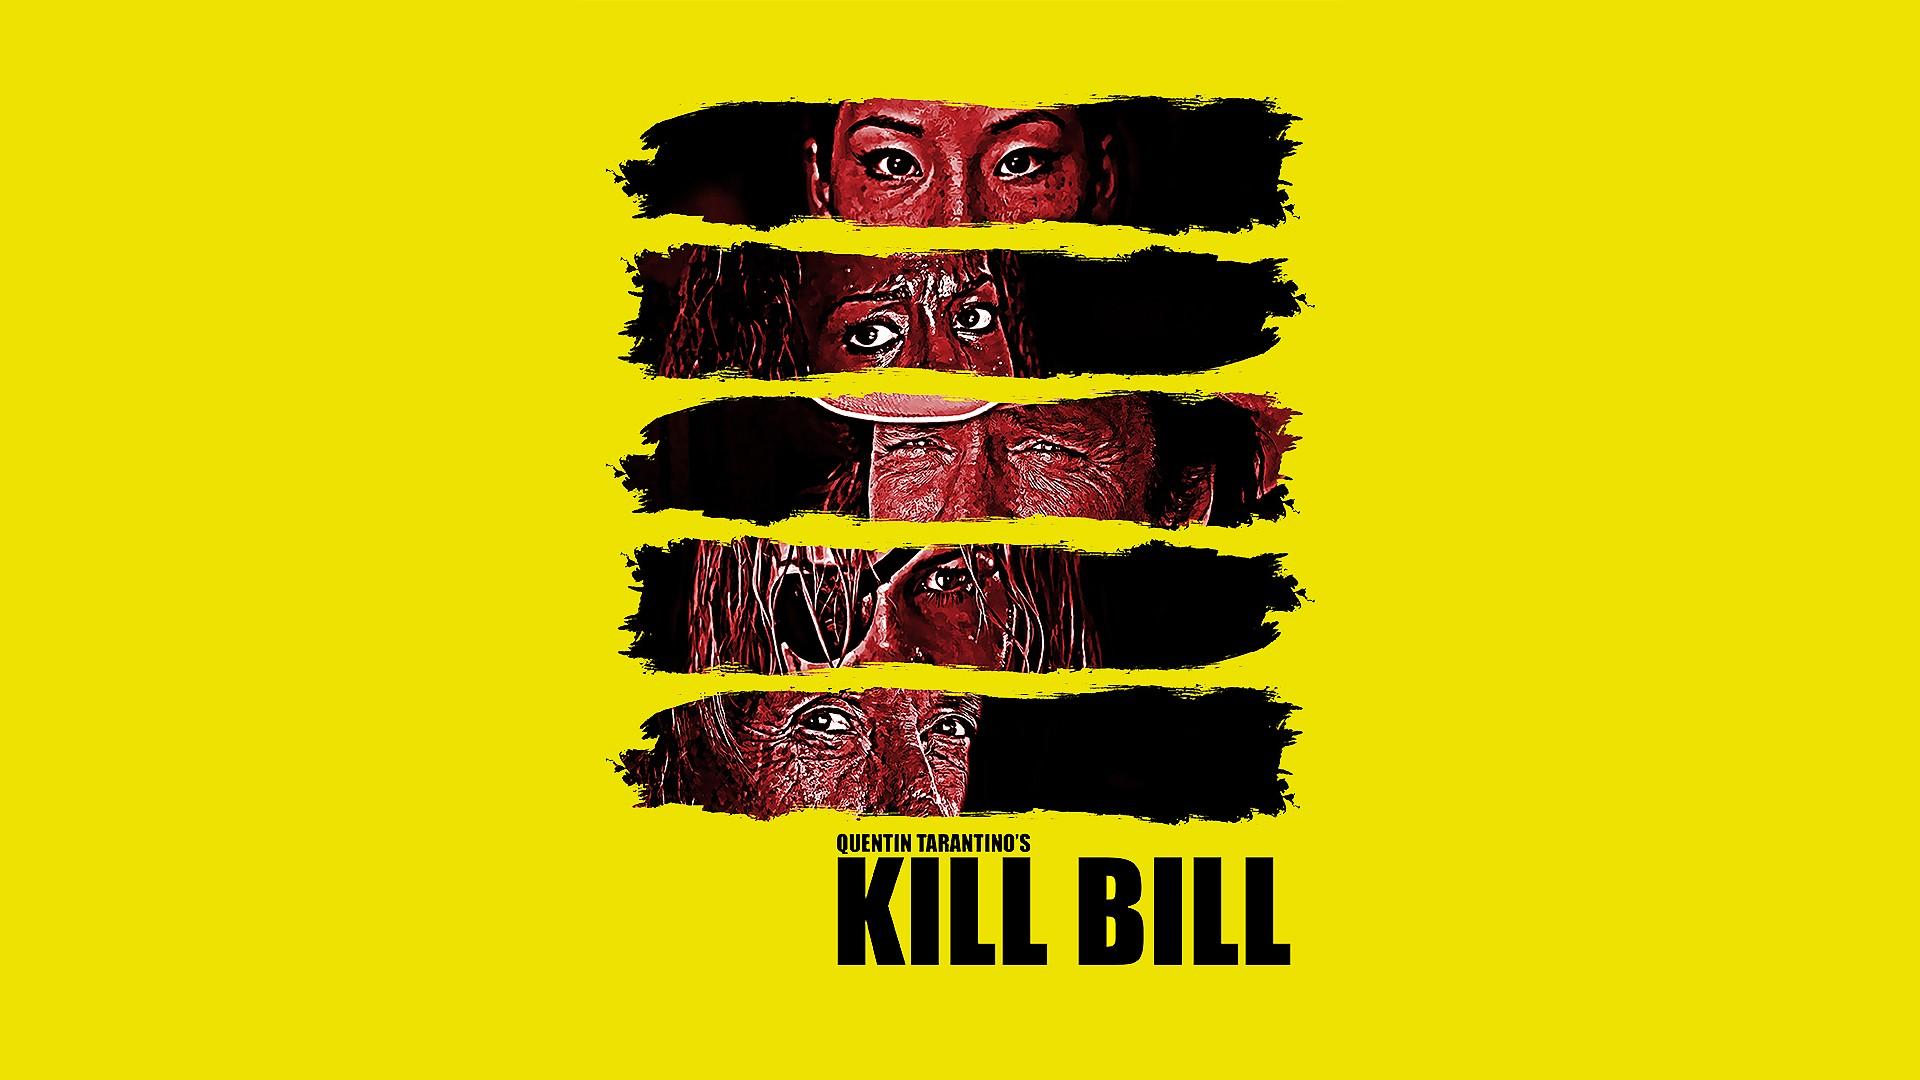 Deadpool Wallpaper Iphone 7 Kill Bill Movie Archives Hdwallsource Com